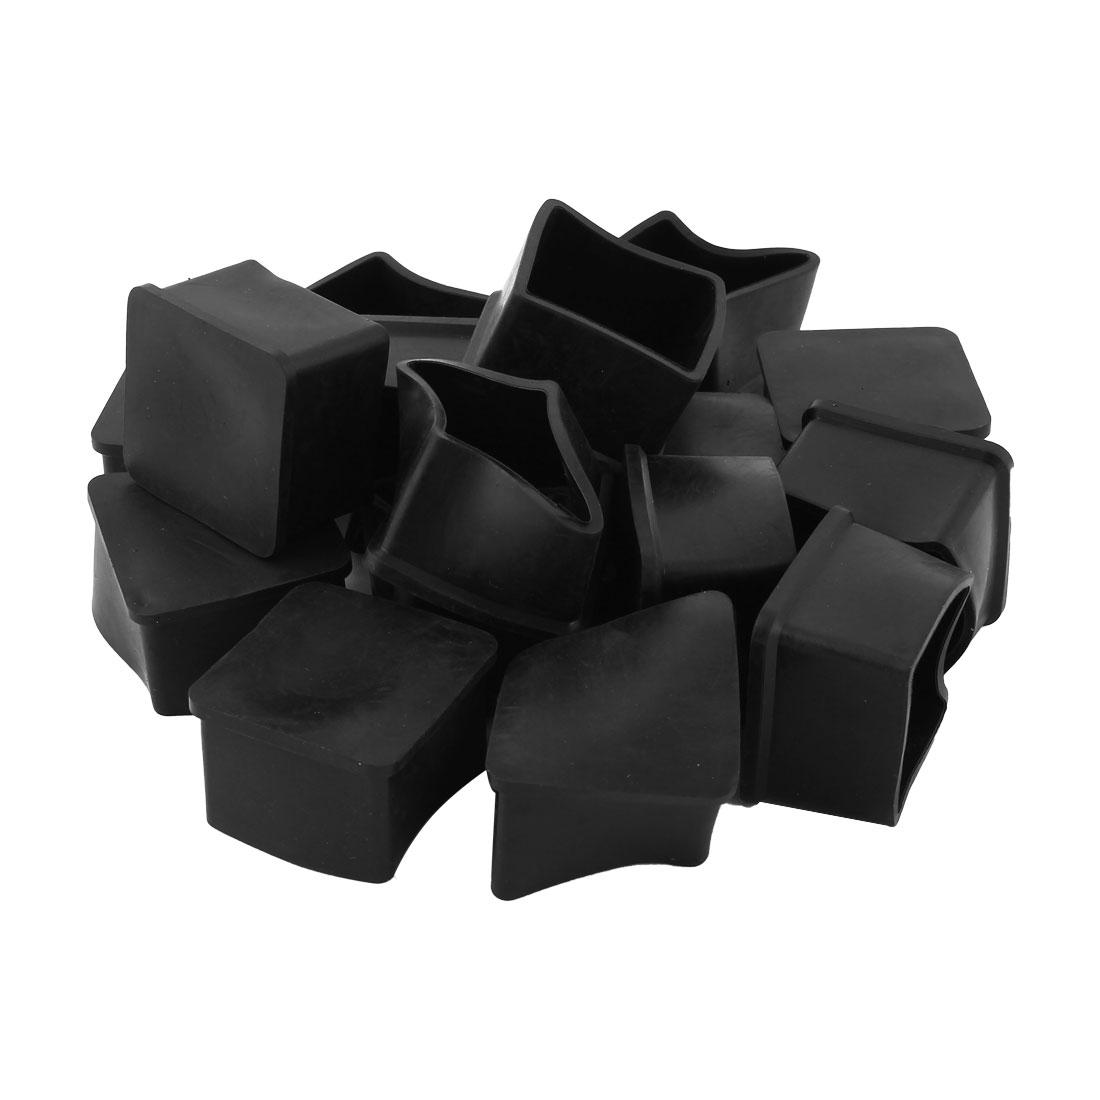 Rubber Furniture Foot Floor Protector Cover Black 35mm x 35mm 17 Pcs